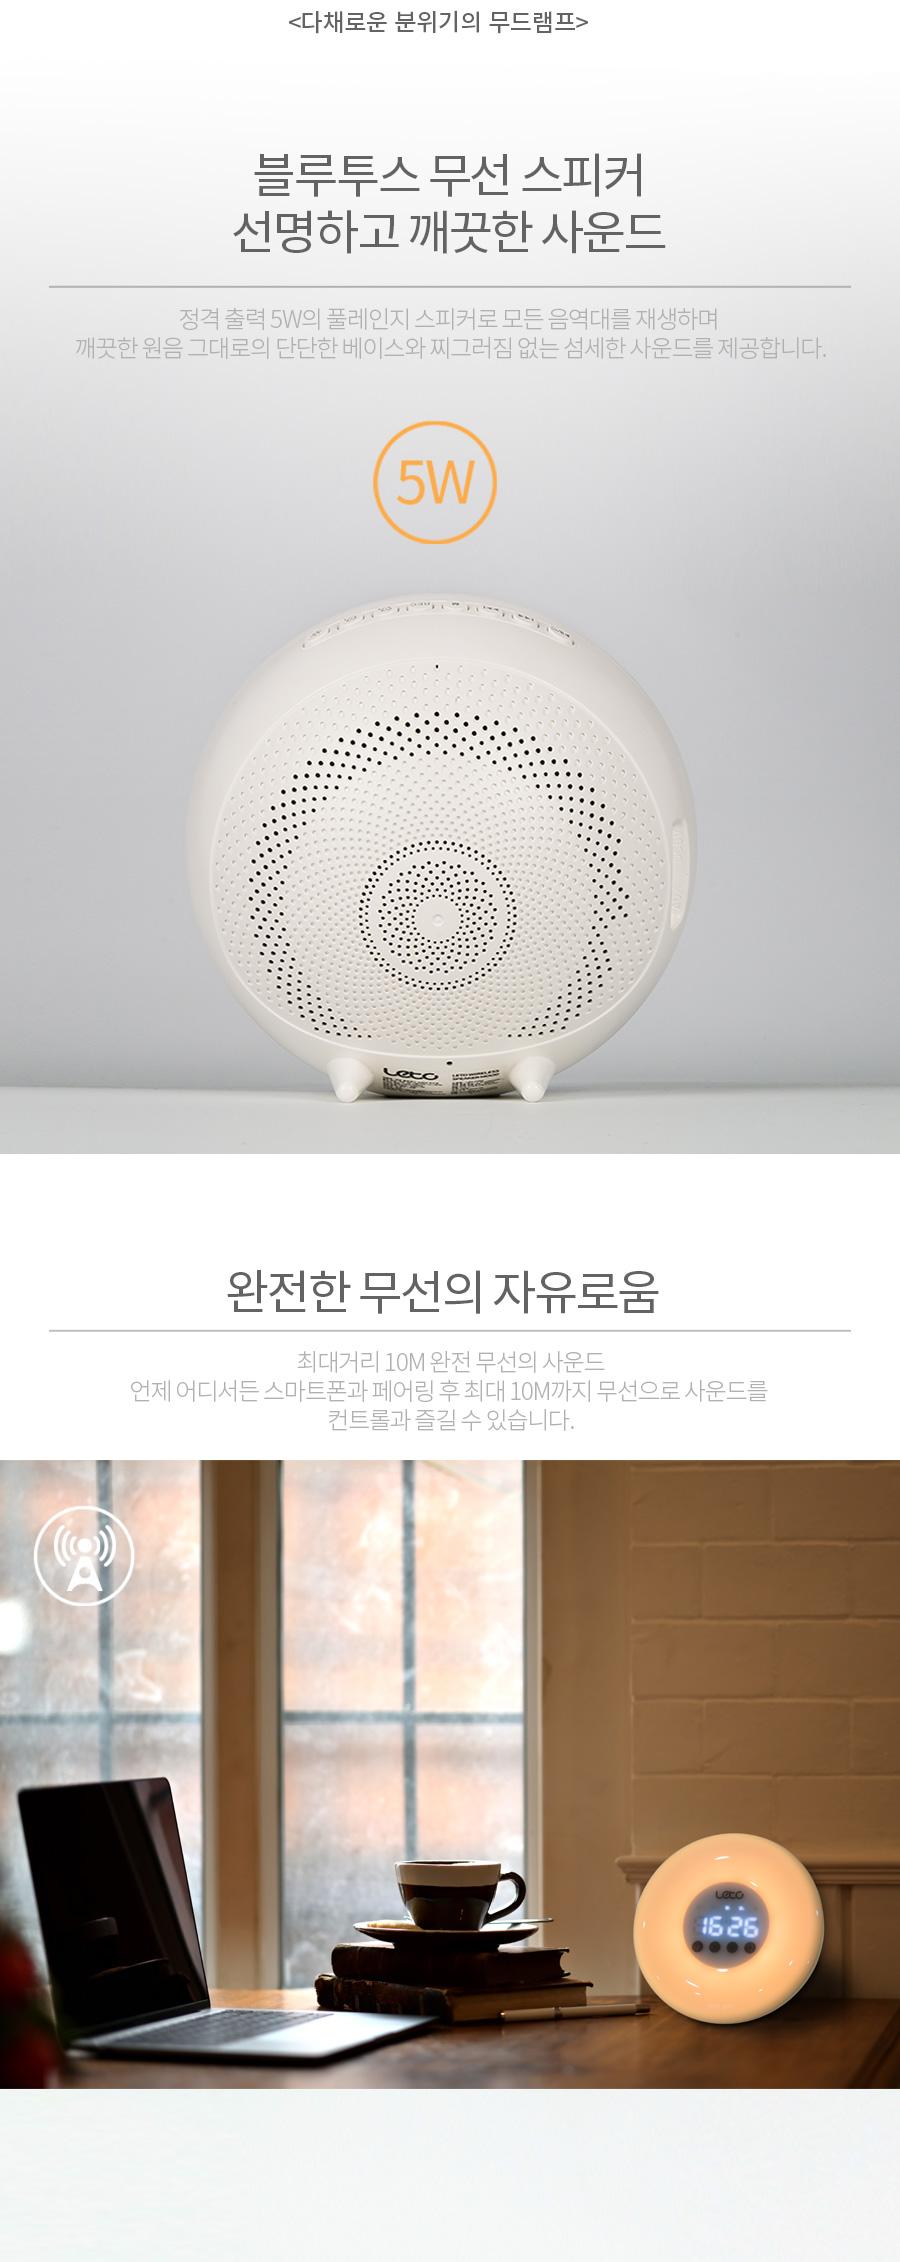 LED무드등 알람시계 겸용 블루투스스피커 LBT-CM03 - 레토, 45,900원, 스피커, 무드등/블루투스 스피커